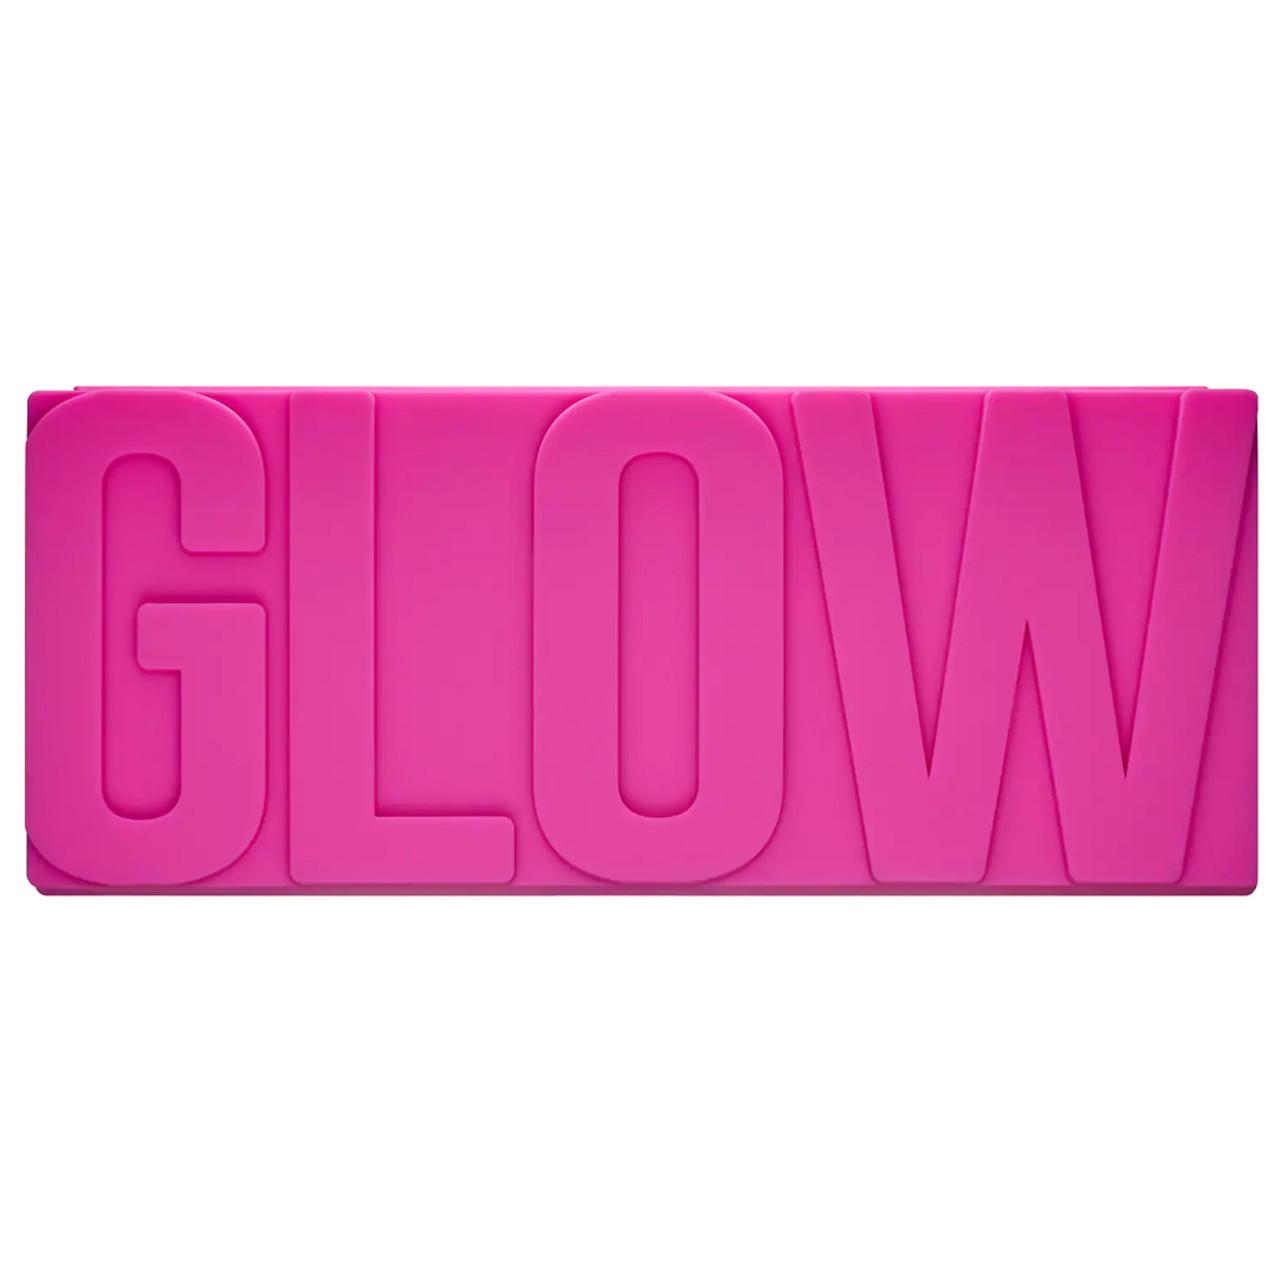 GlamGlow Glowpowder Hyaluronic Acid Infused Glow Palette